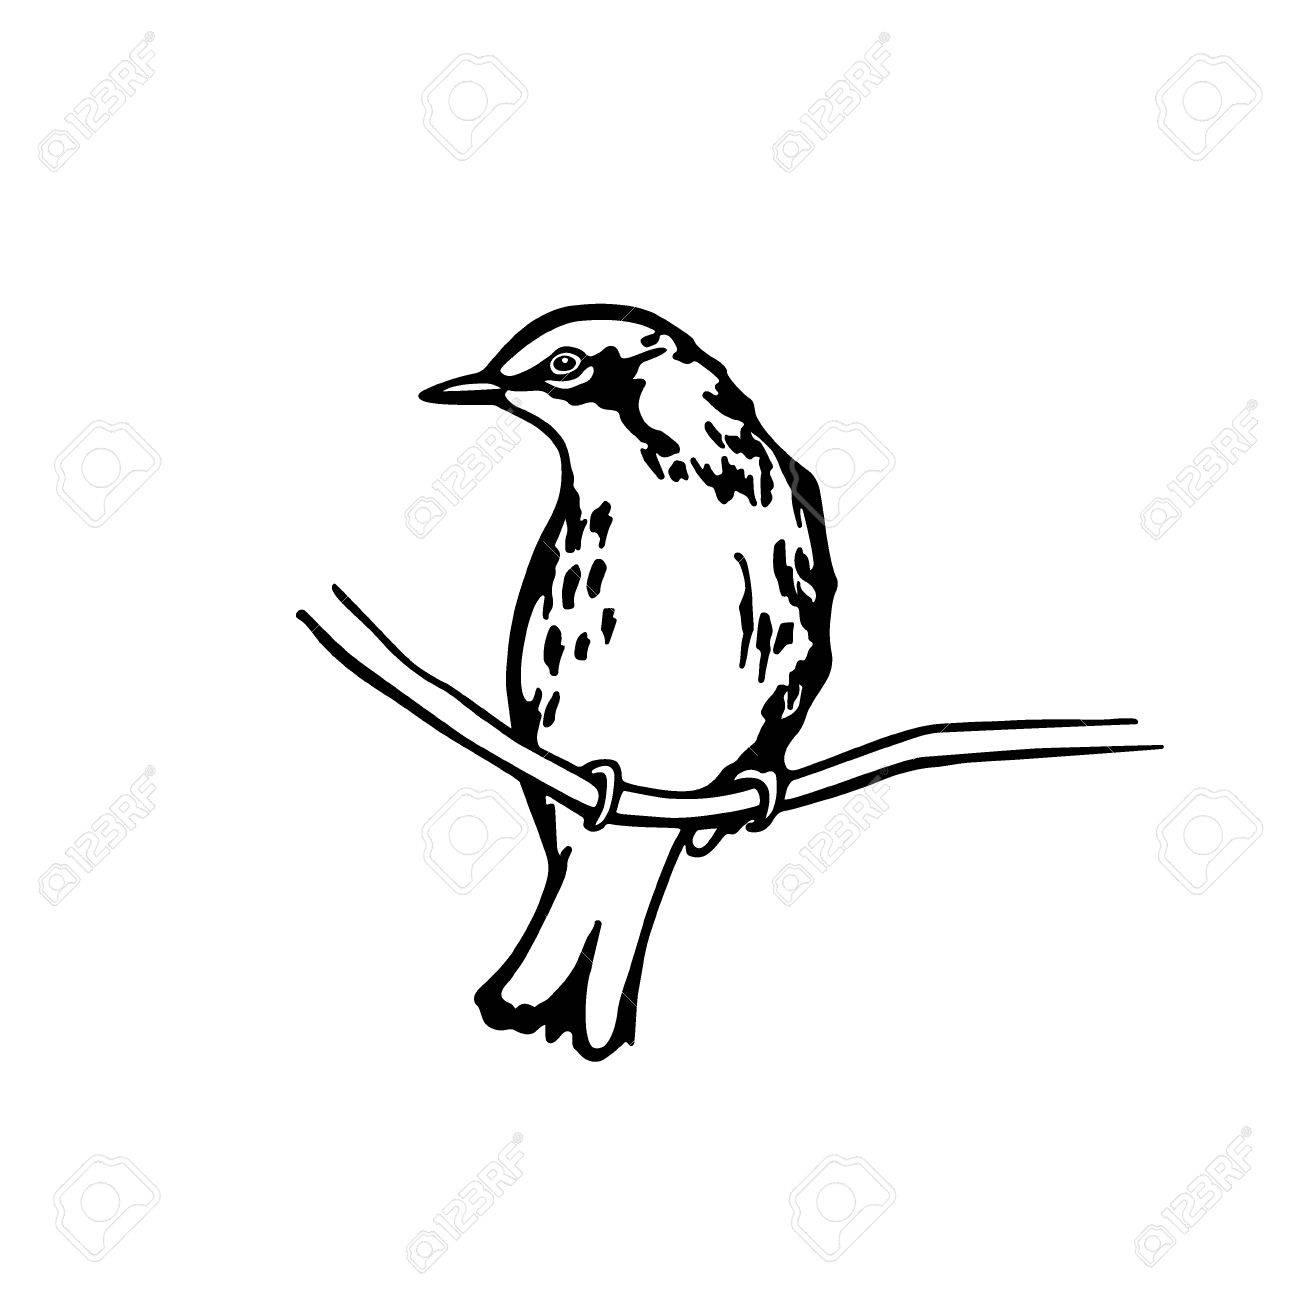 1300x1300 Vector Illustration Of Hand Drawn North America Bird Sitting